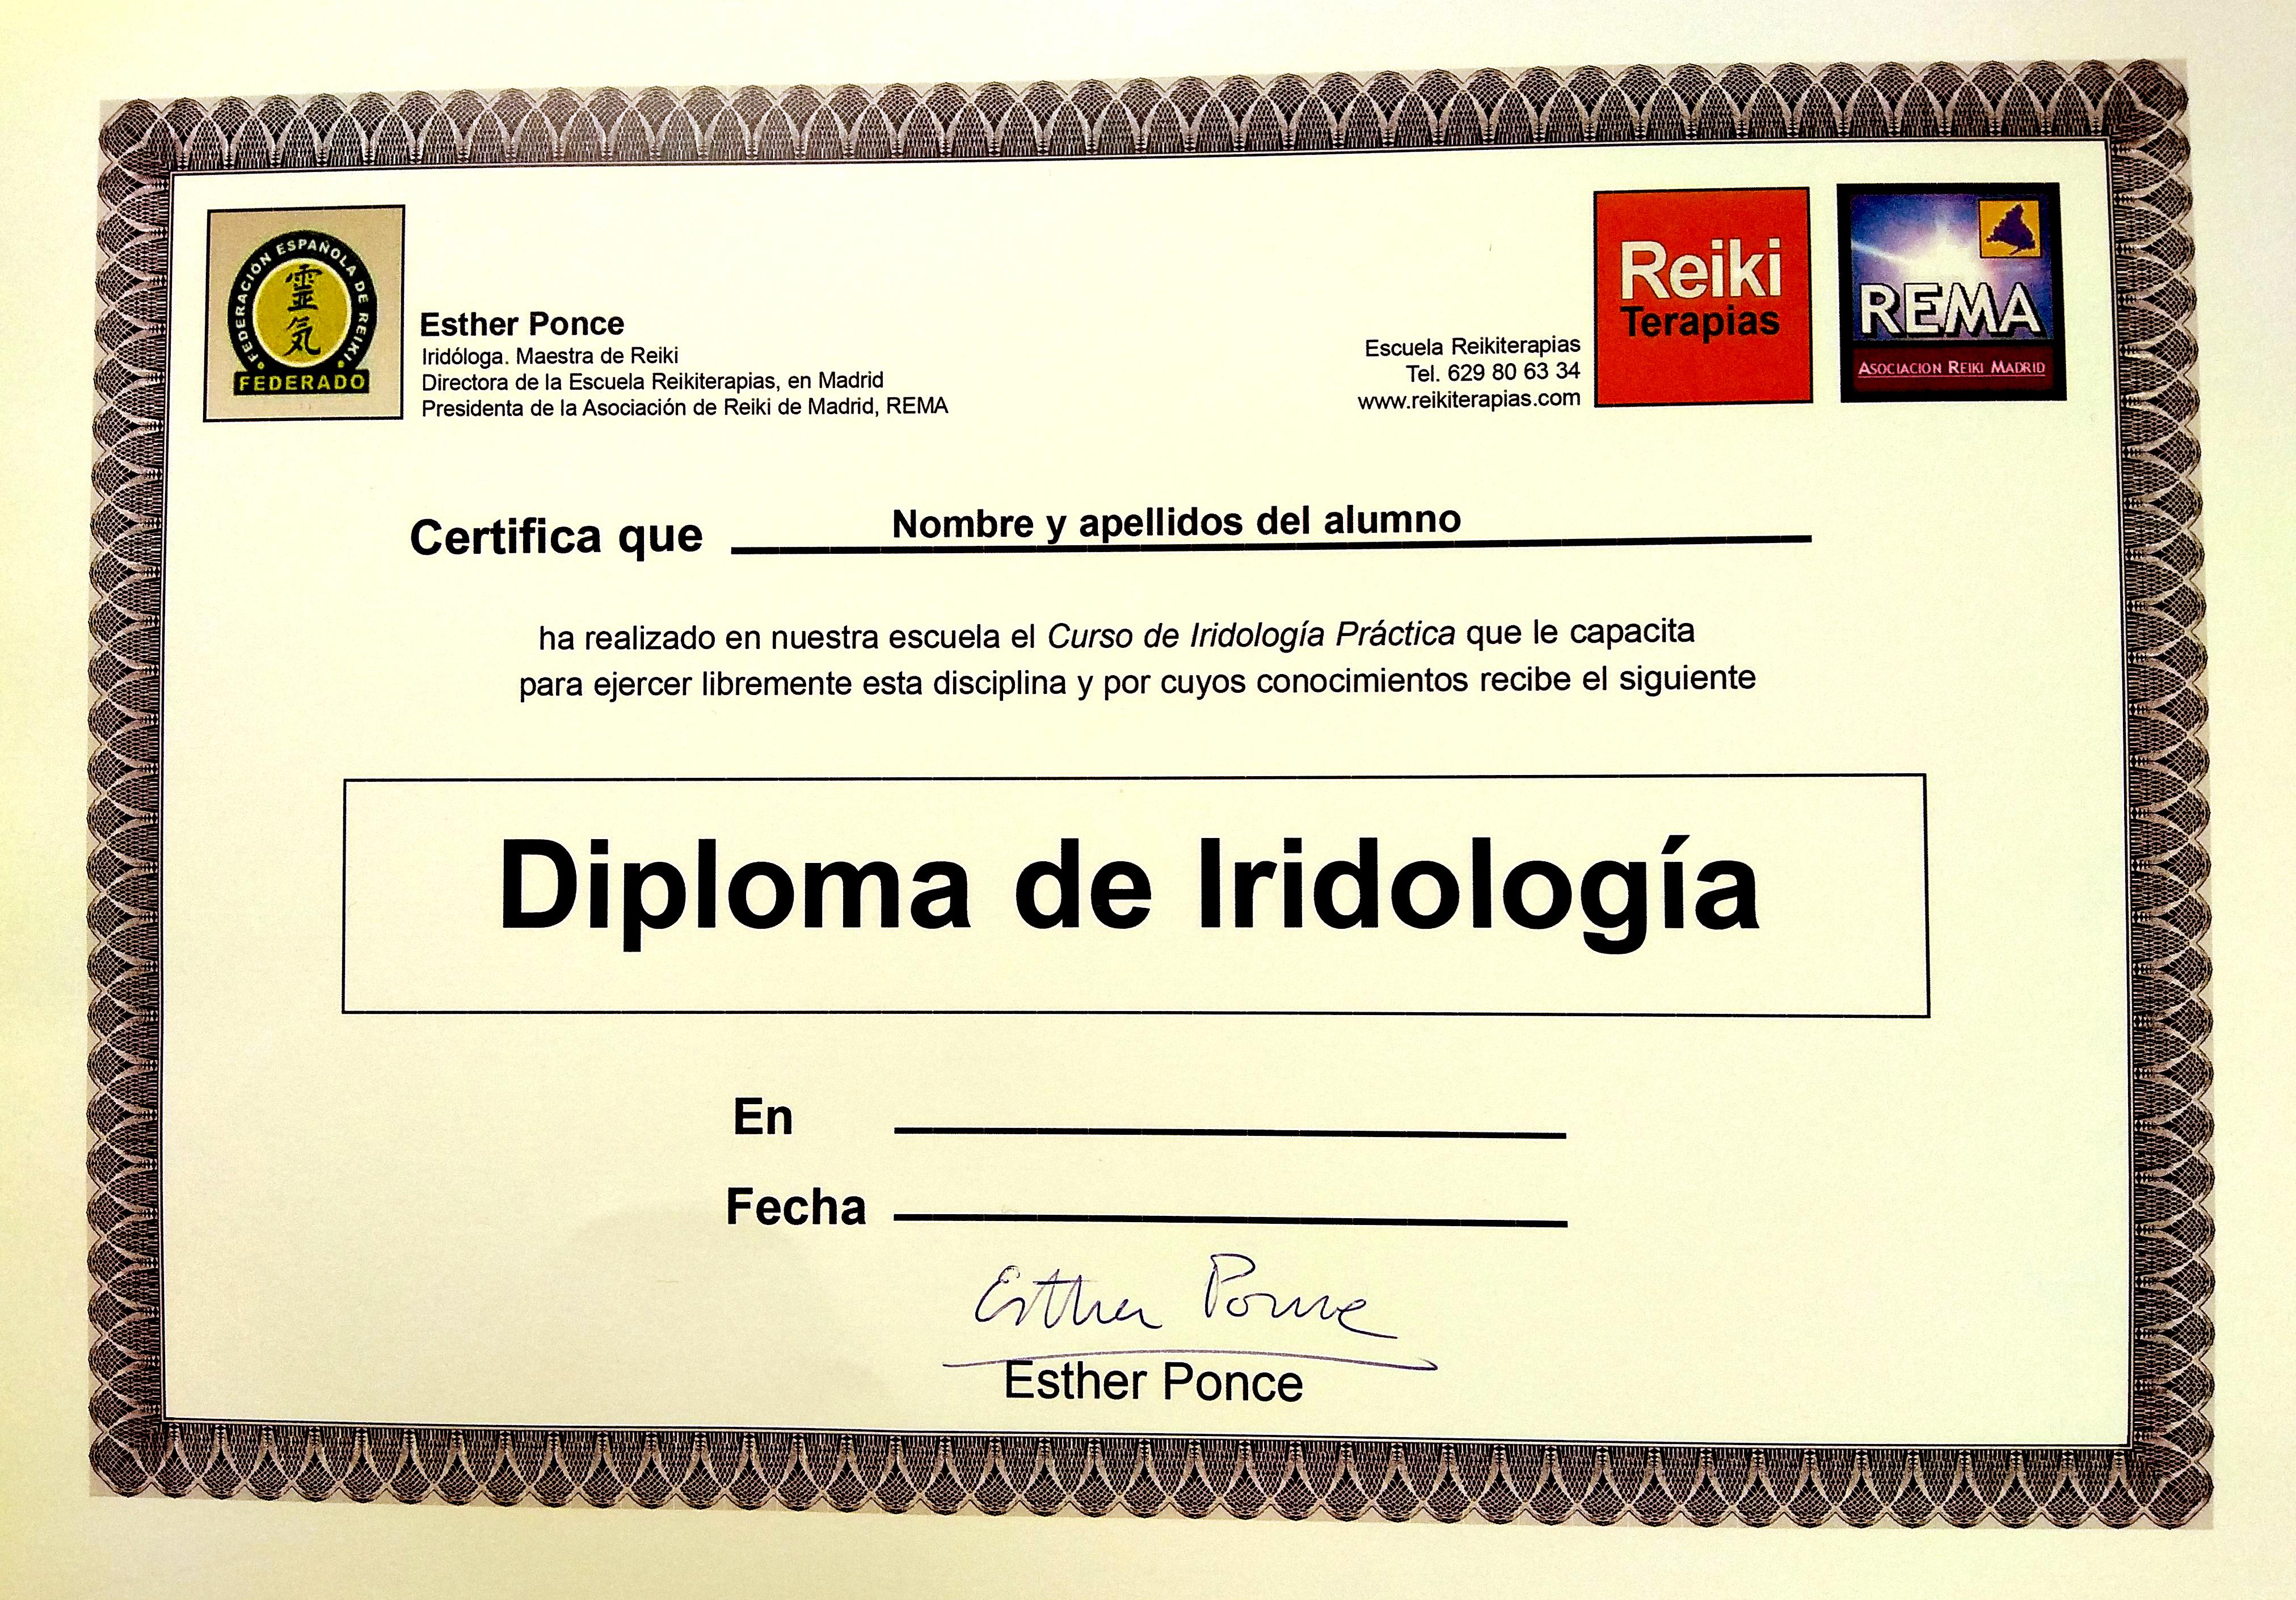 cursos iridología madrid, diploma escuela reikiterapias